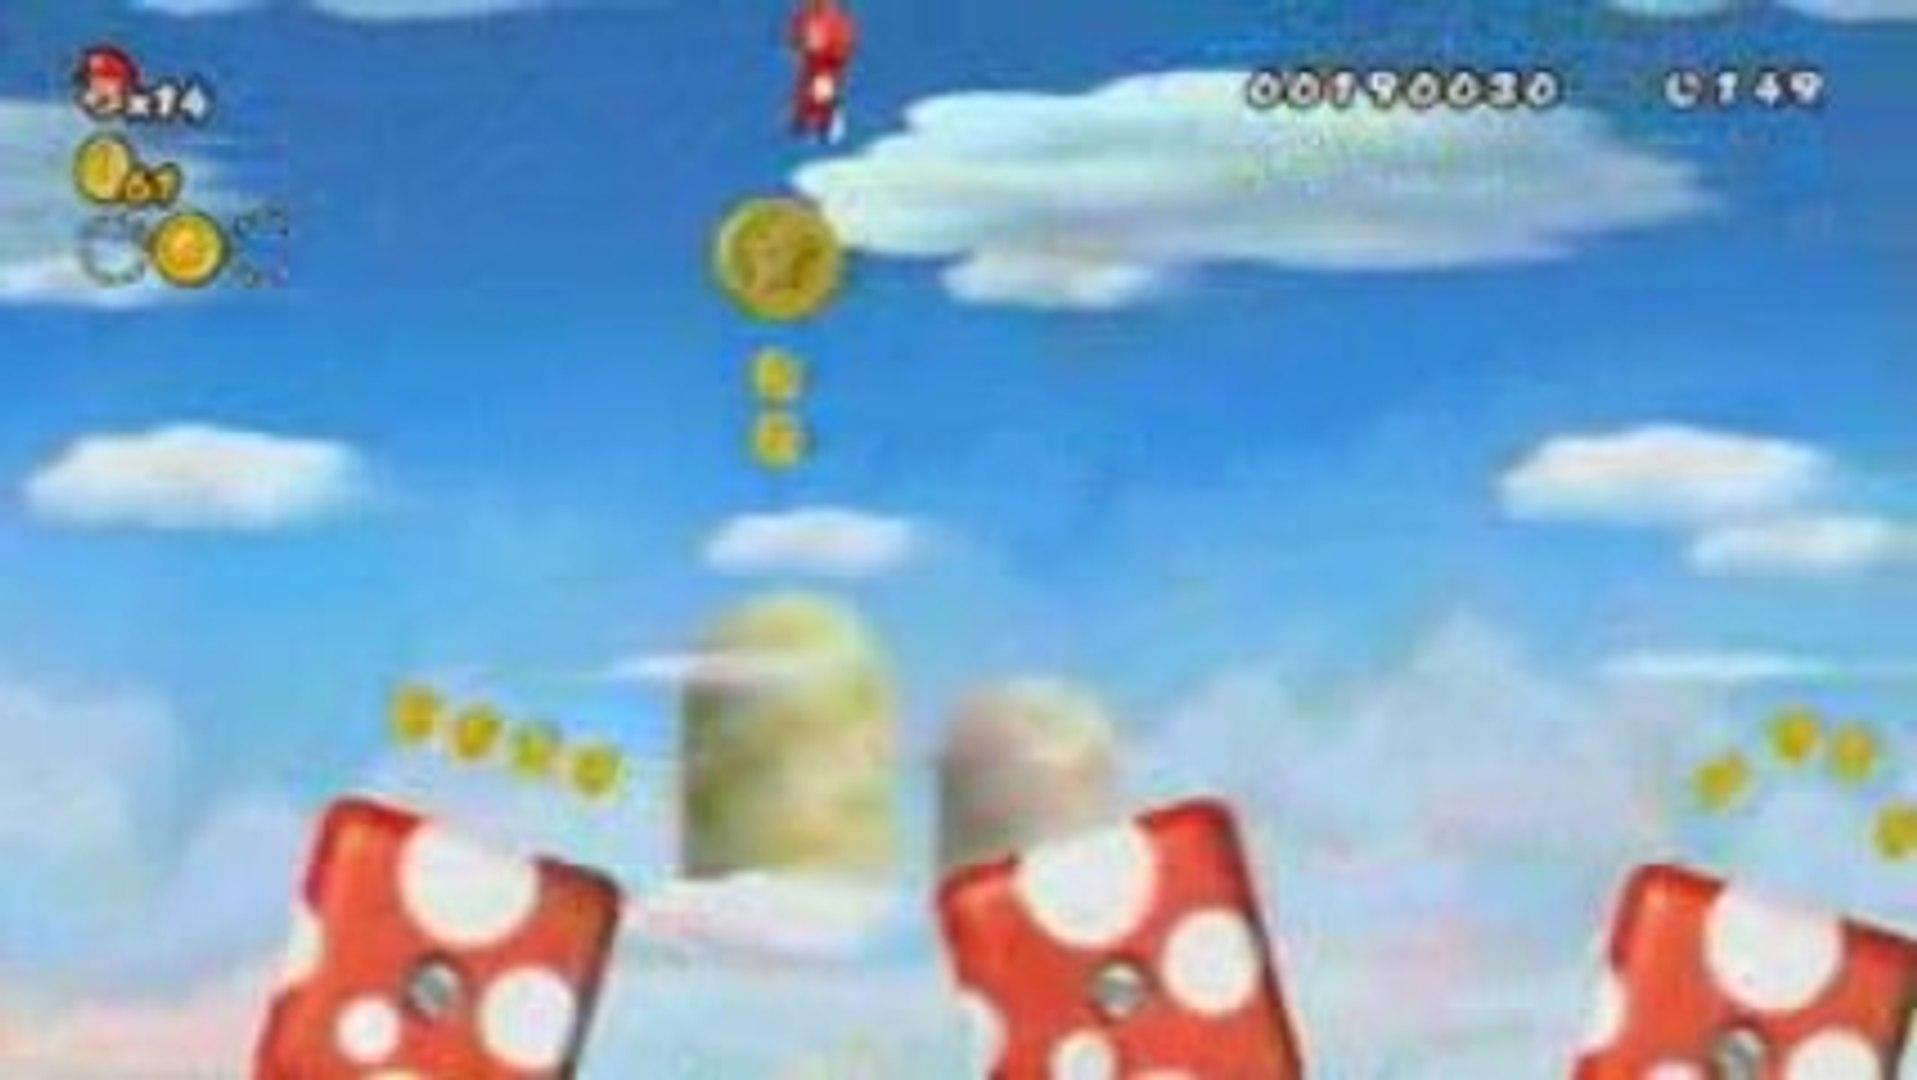 New Super Mario Bros. Wii - Propeller Suit Trailer